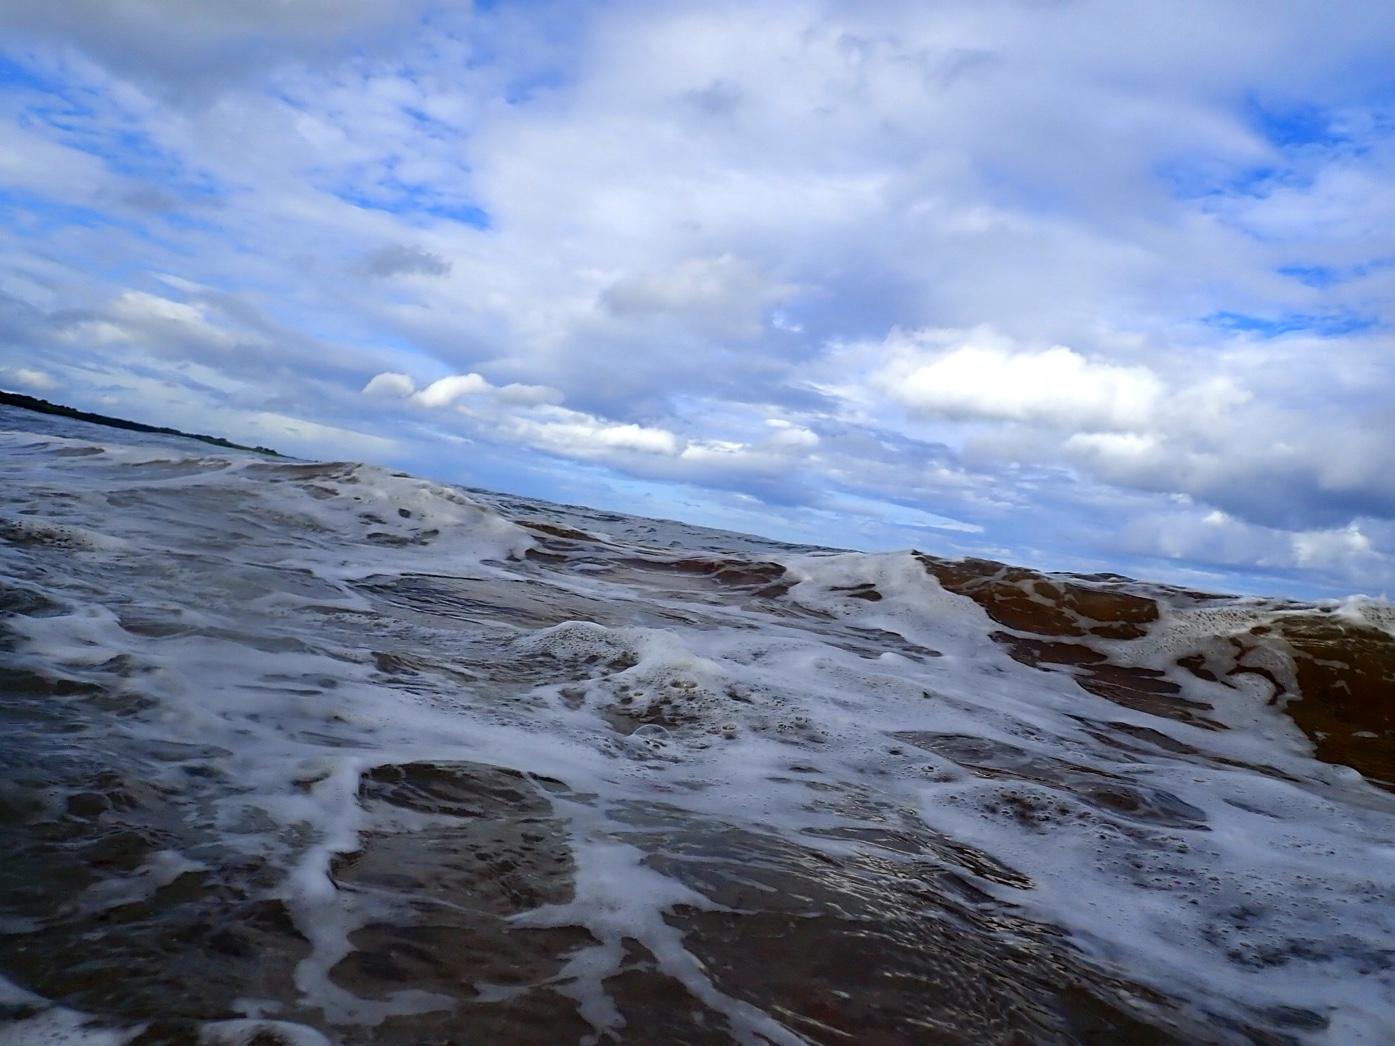 2012, HR Wallingford Ltd., Skerries Tidal Site, Follow-up to 2009 Metocean Study